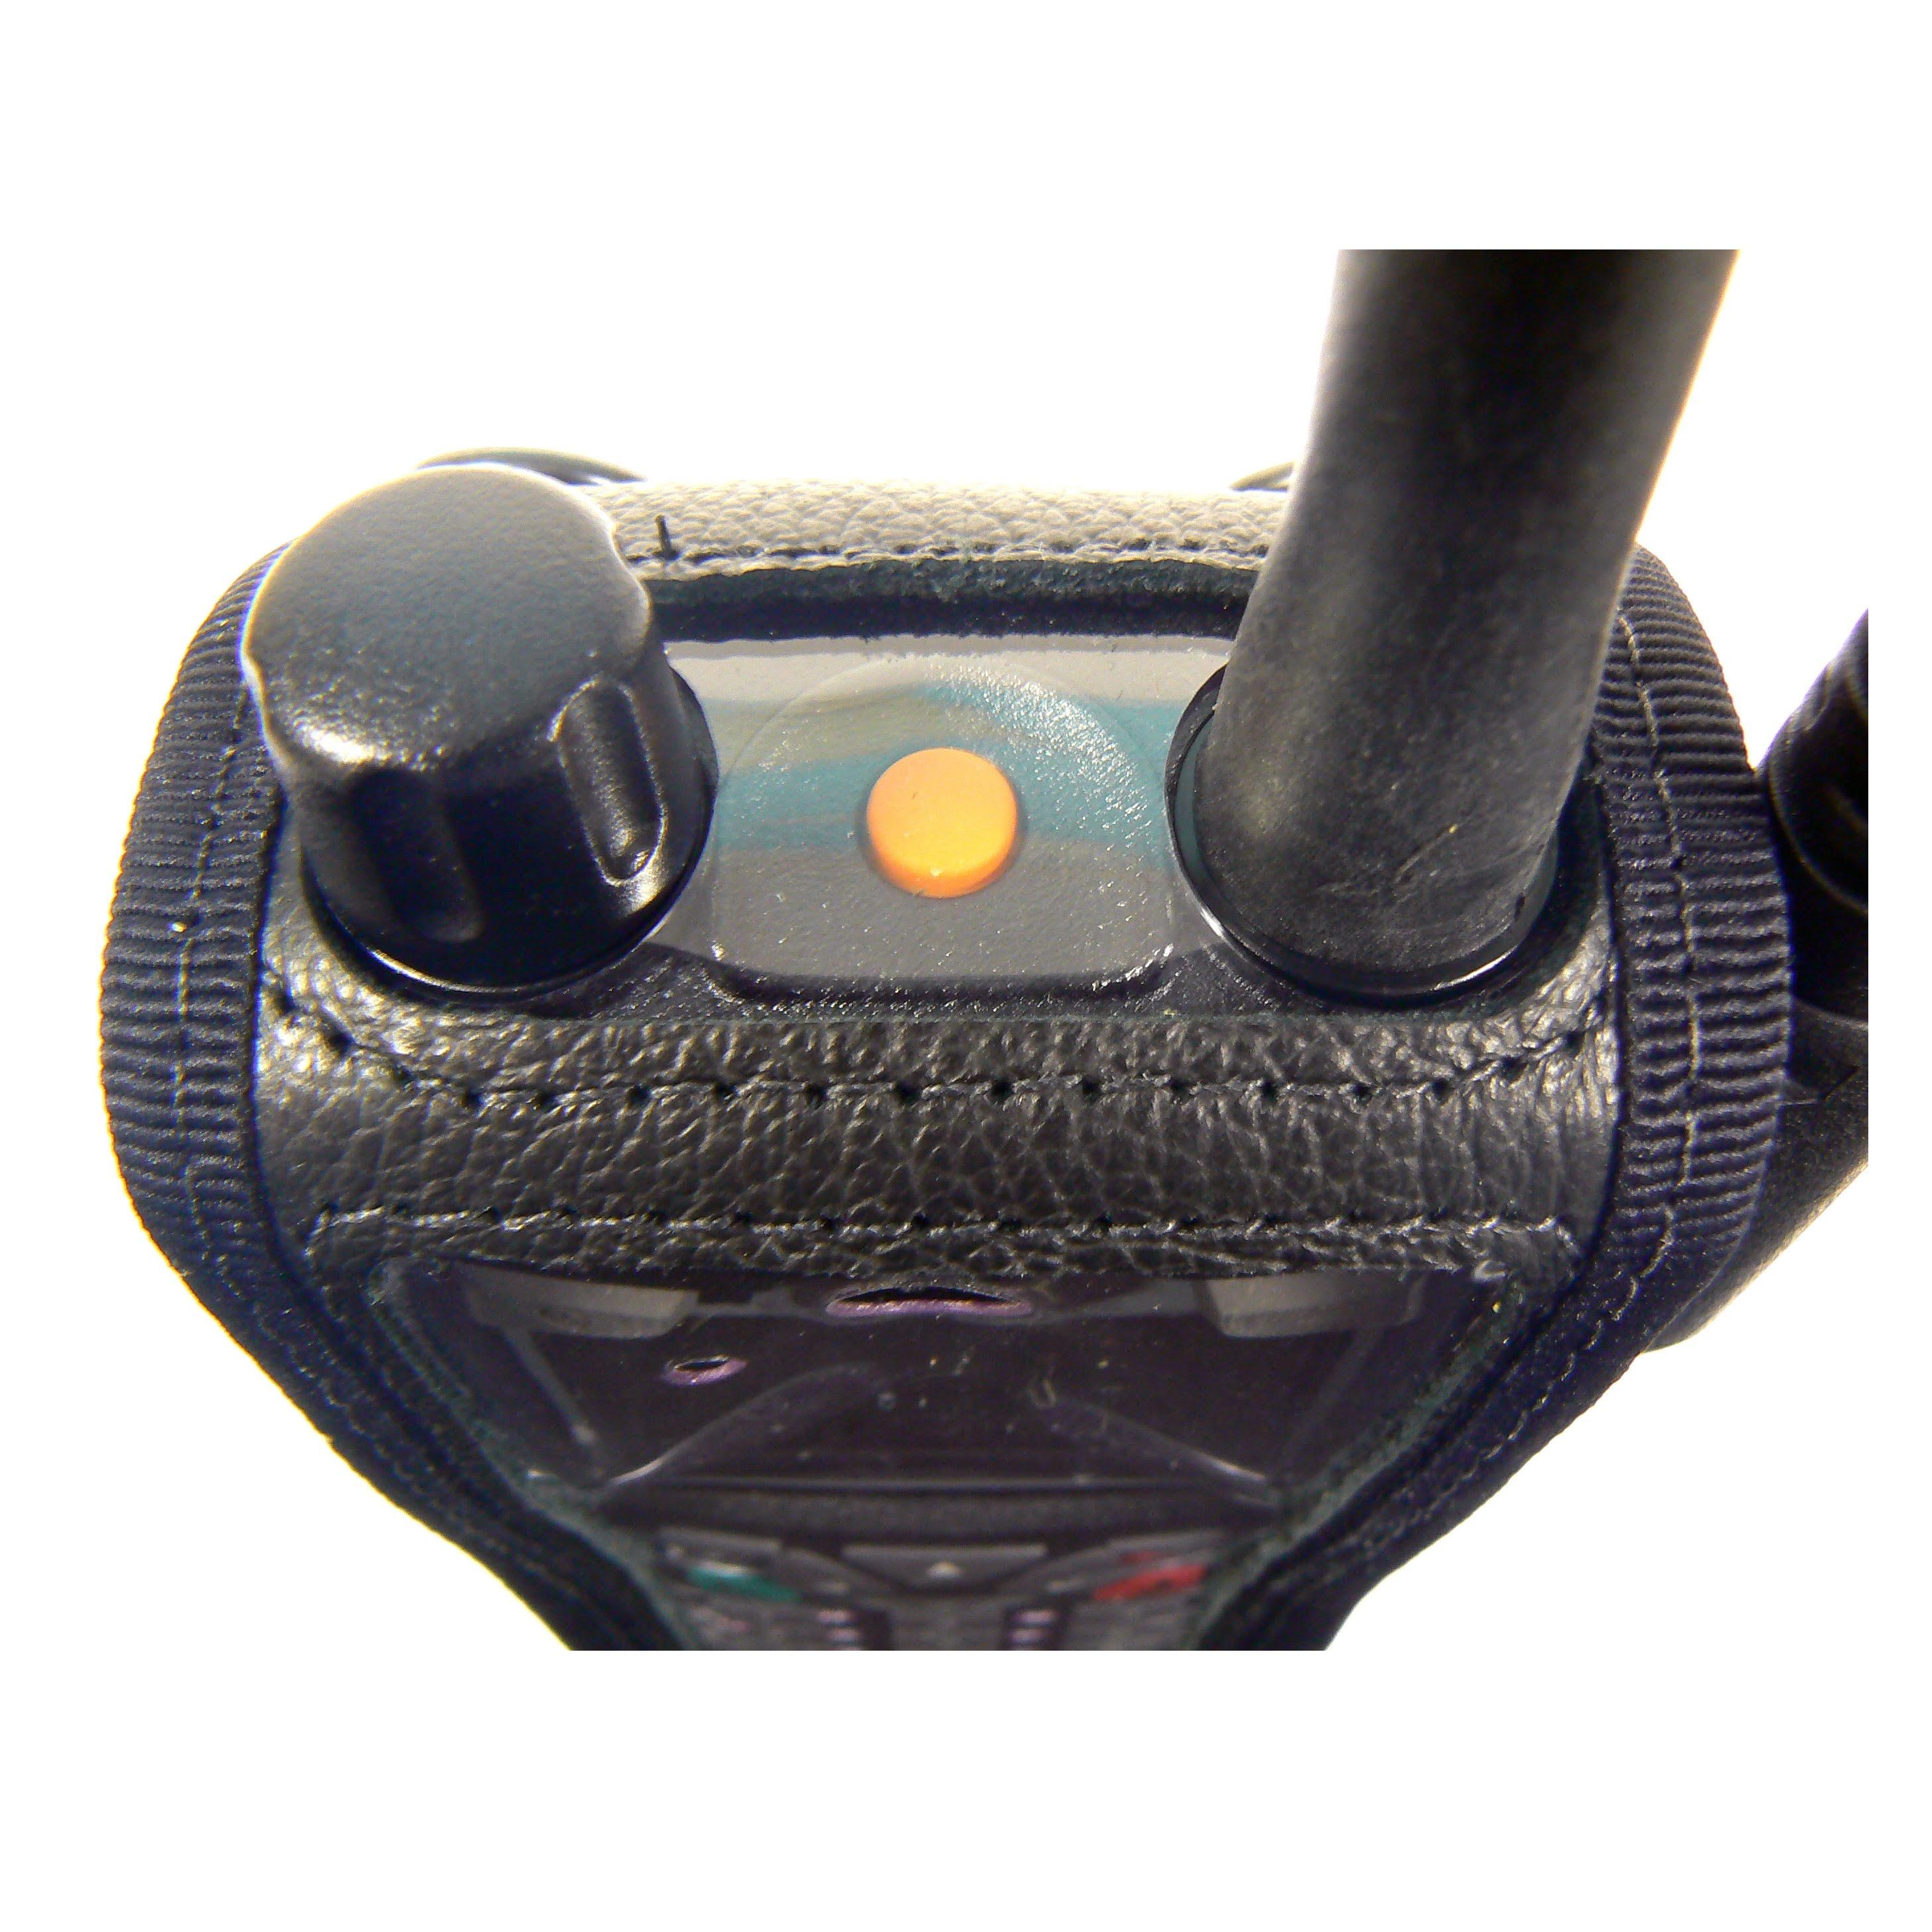 Sepura STP8000 Radio Case Leather with Click-On